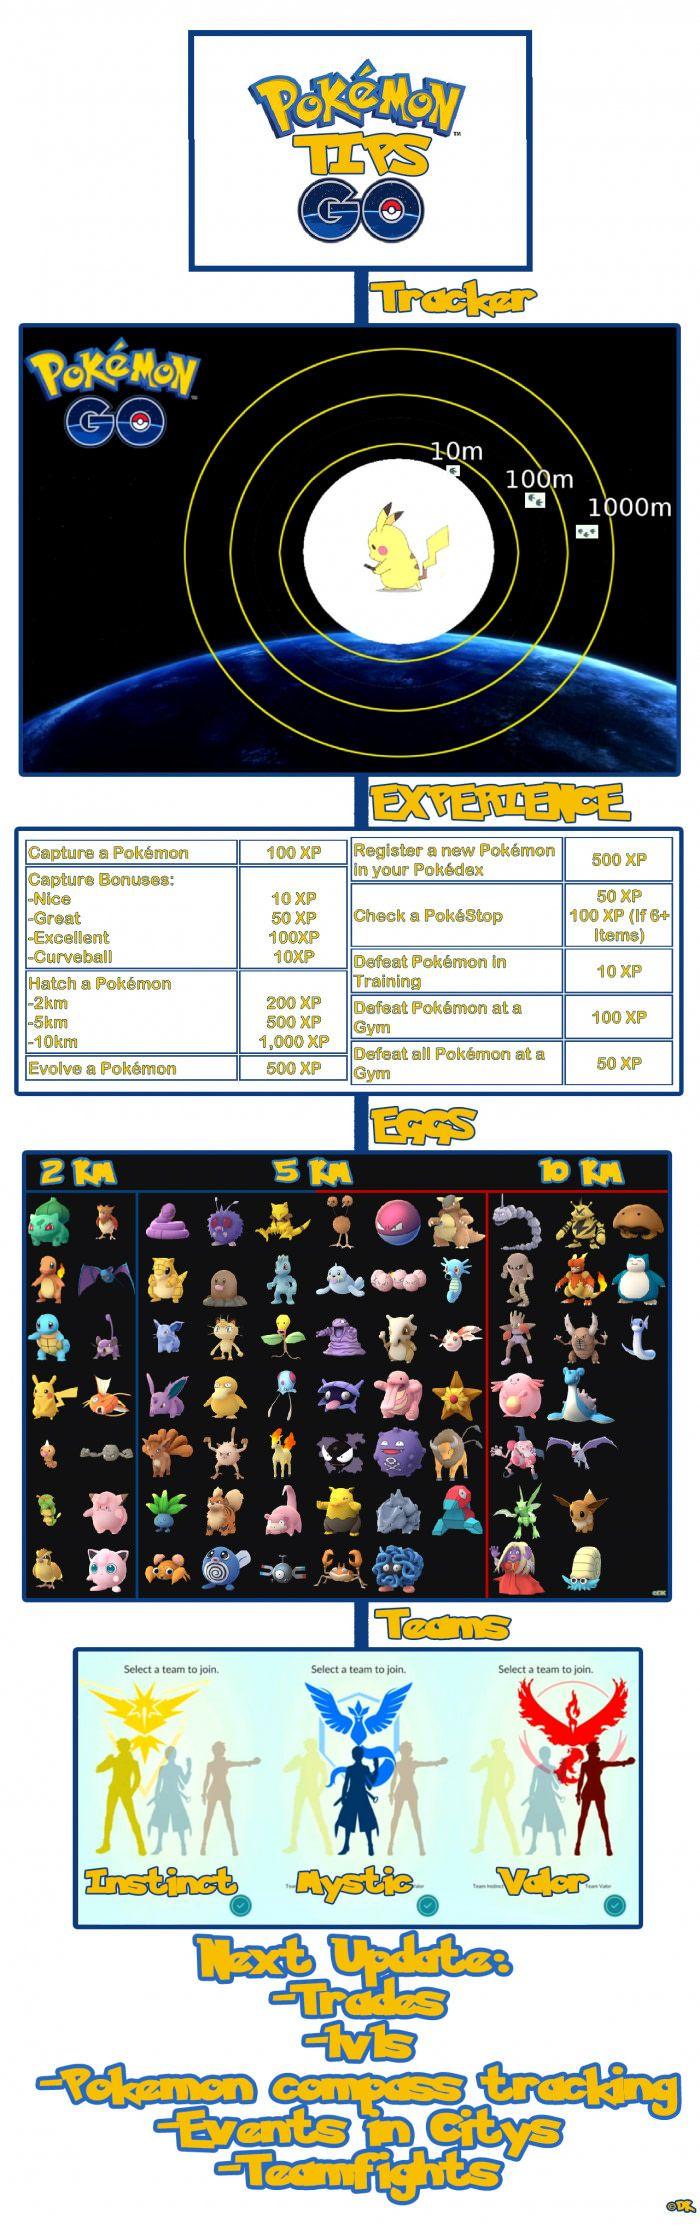 Pokemon GO Tips. Pokemon Go - Get Pokecoins http://ibourl.com/33ao